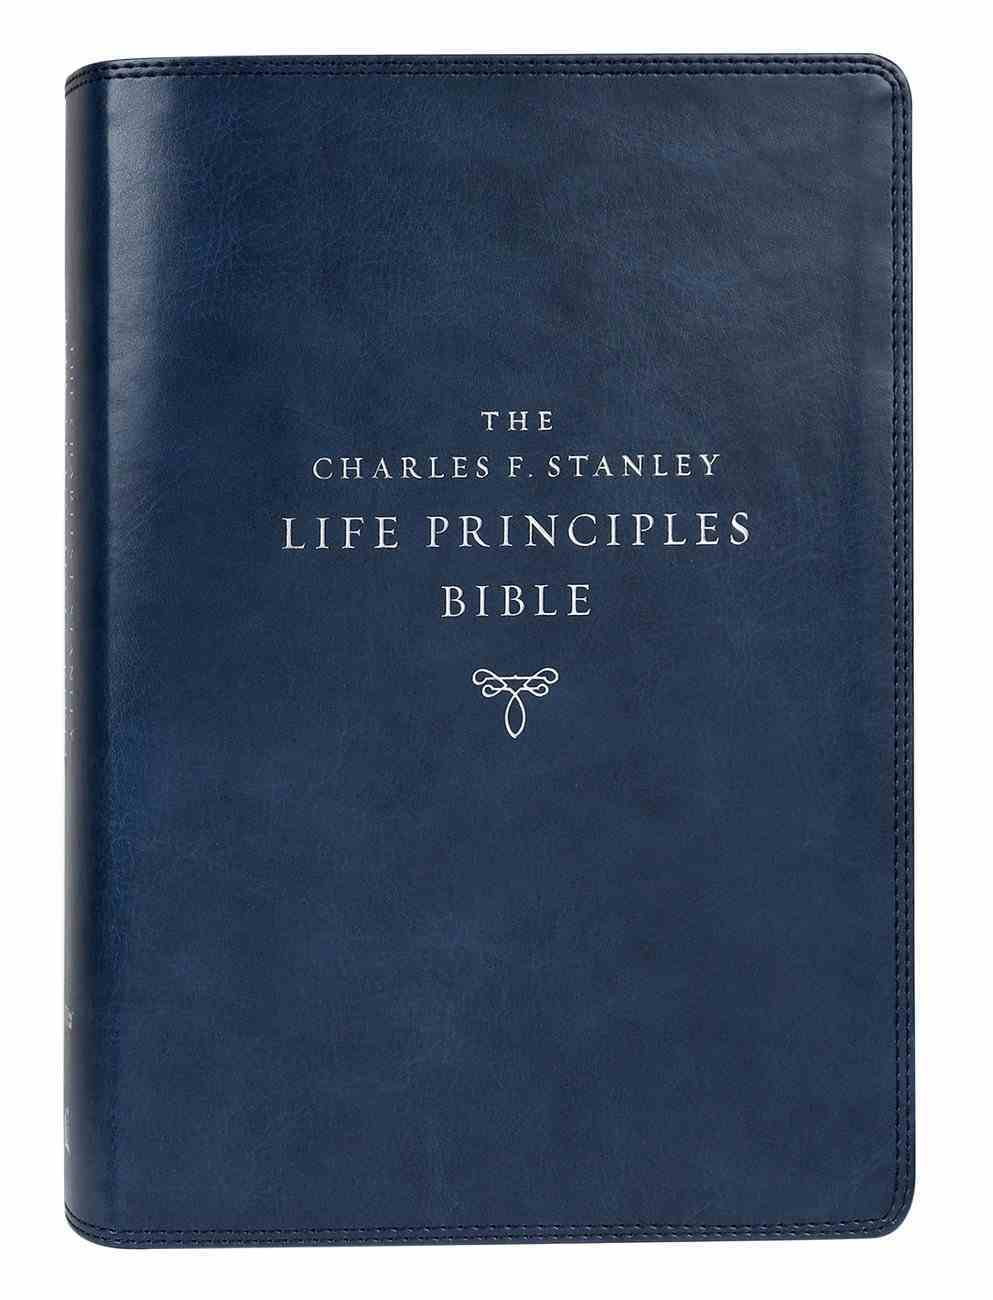 NIV Charles F Stanley Life Principles Bible Blue Thumb Index (2nd Edition) Premium Imitation Leather